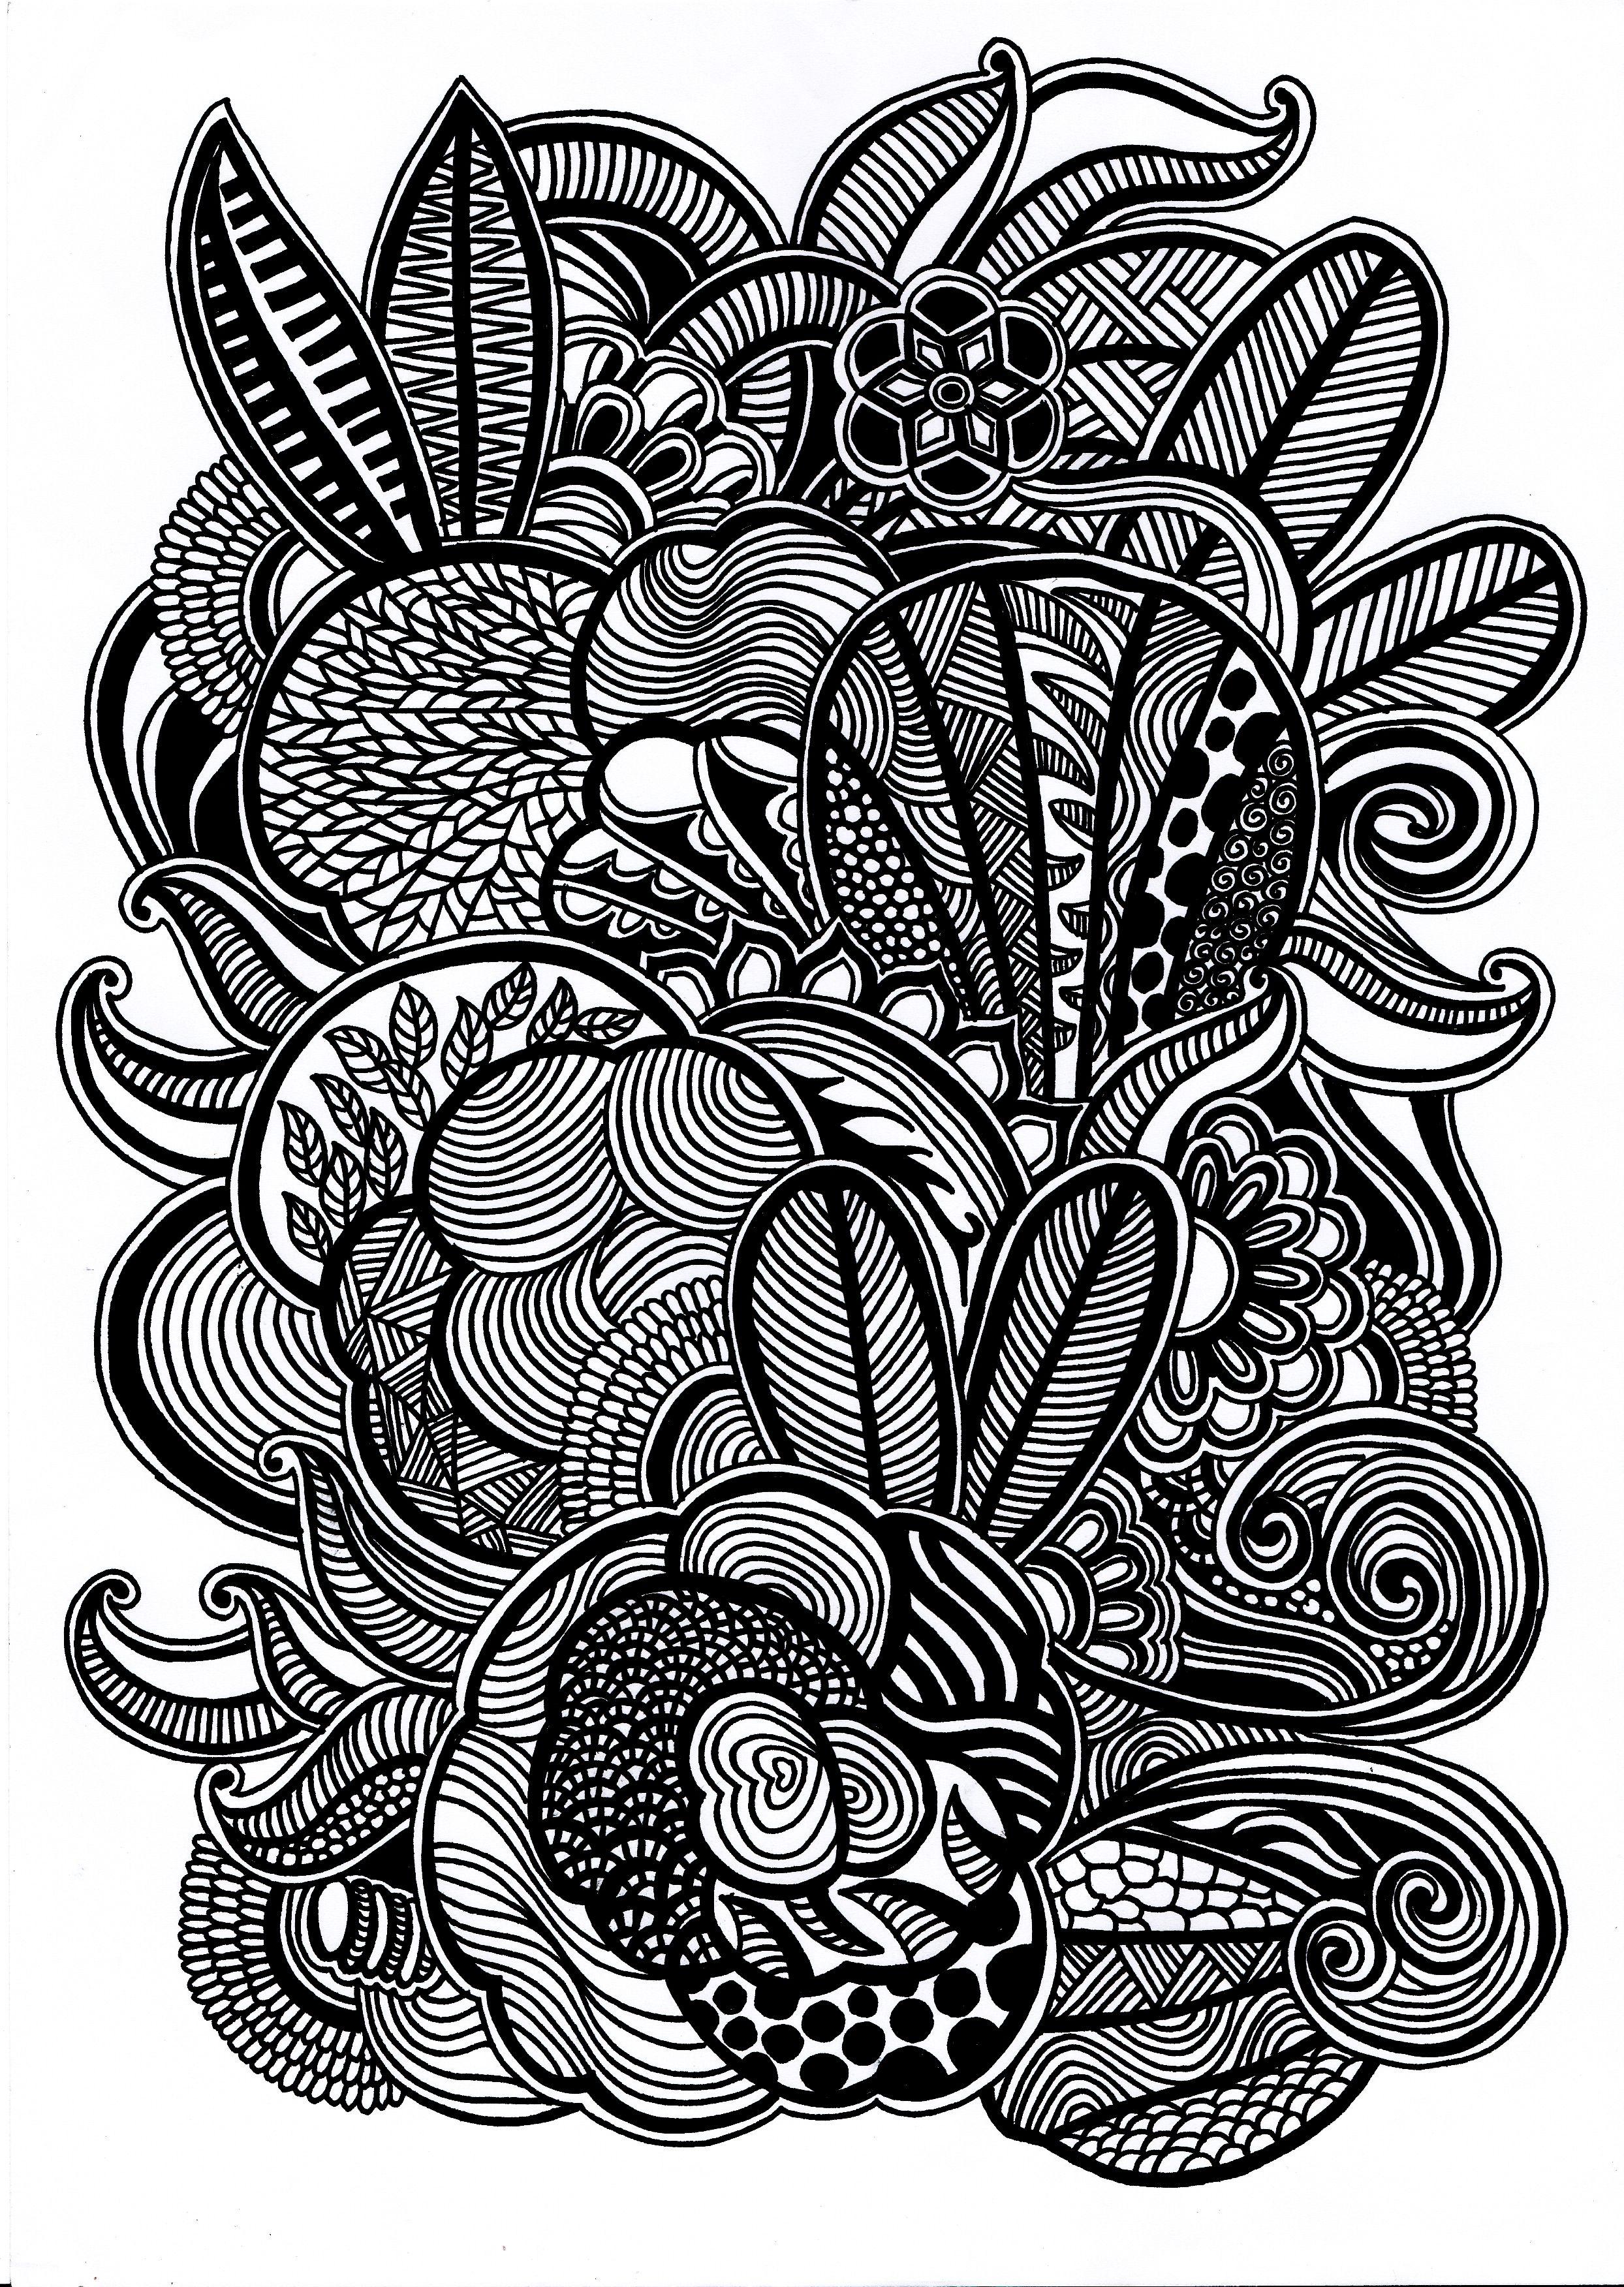 Foliage forest doodles doodling drawing black white doodle